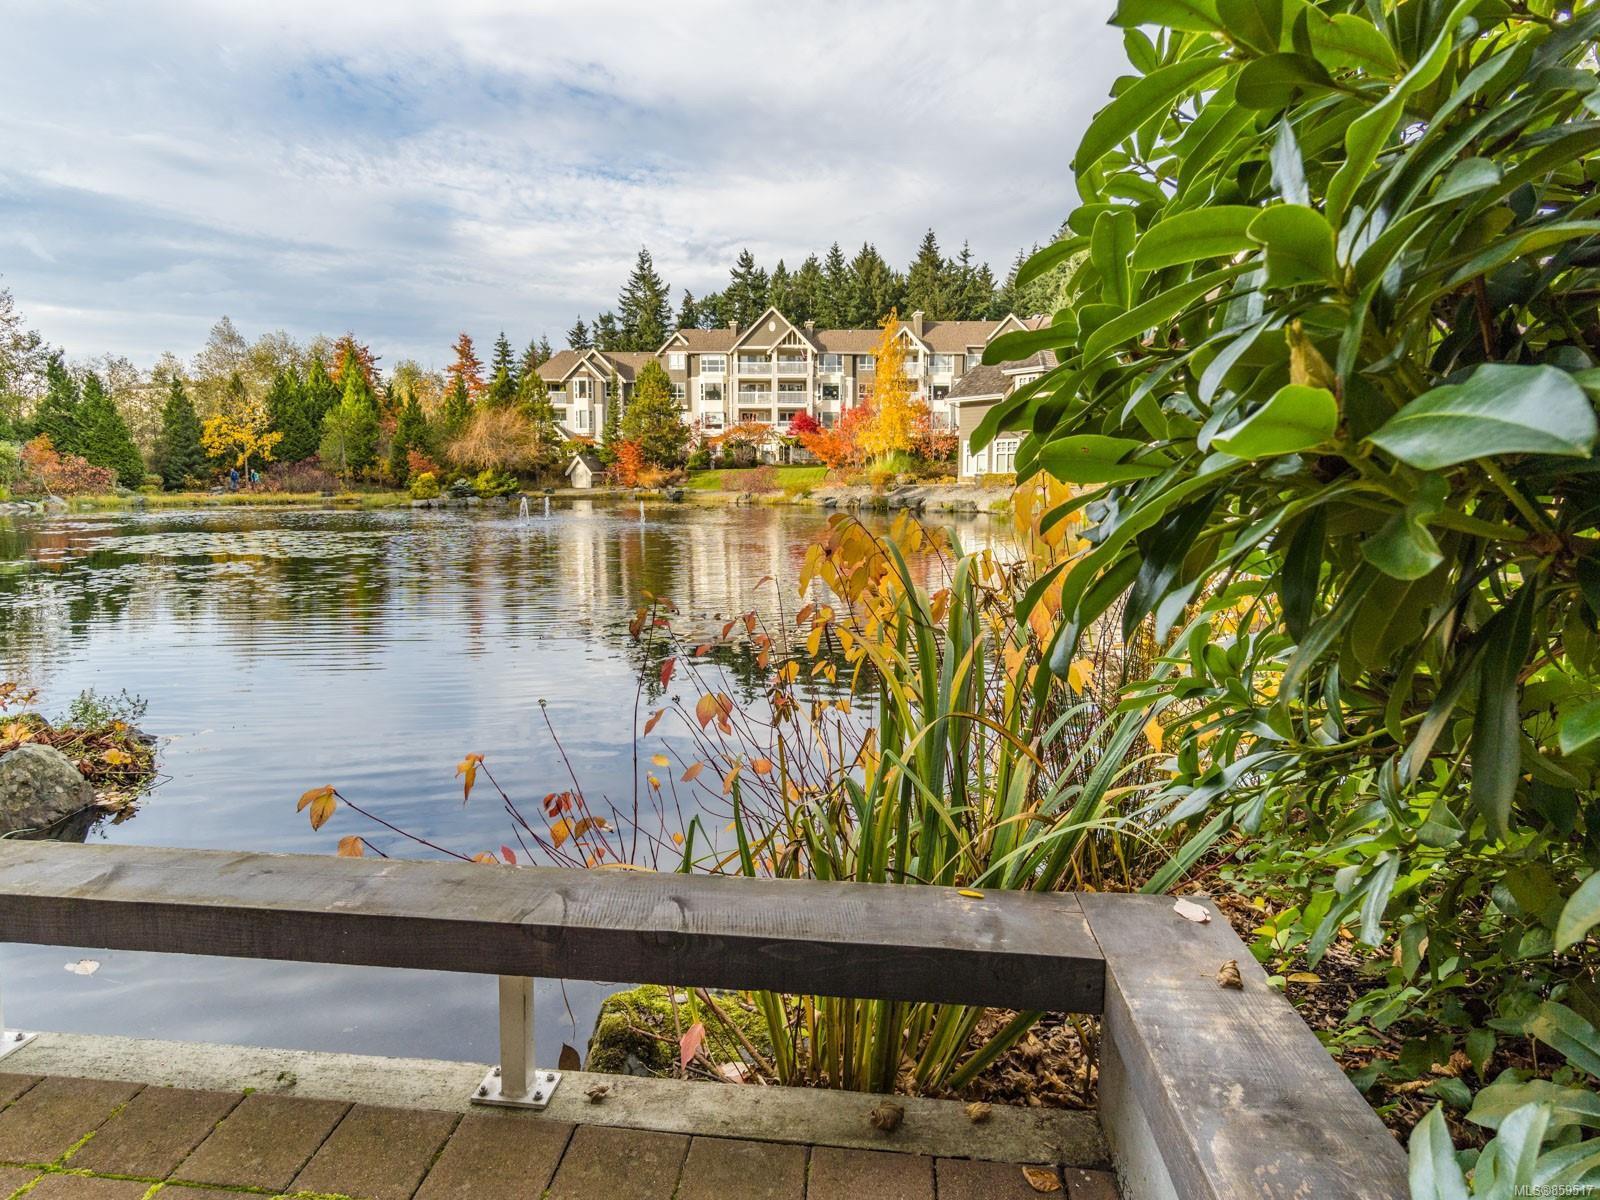 Main Photo: 108 5650 Edgewater Lane in : Na North Nanaimo Condo for sale (Nanaimo)  : MLS®# 859517